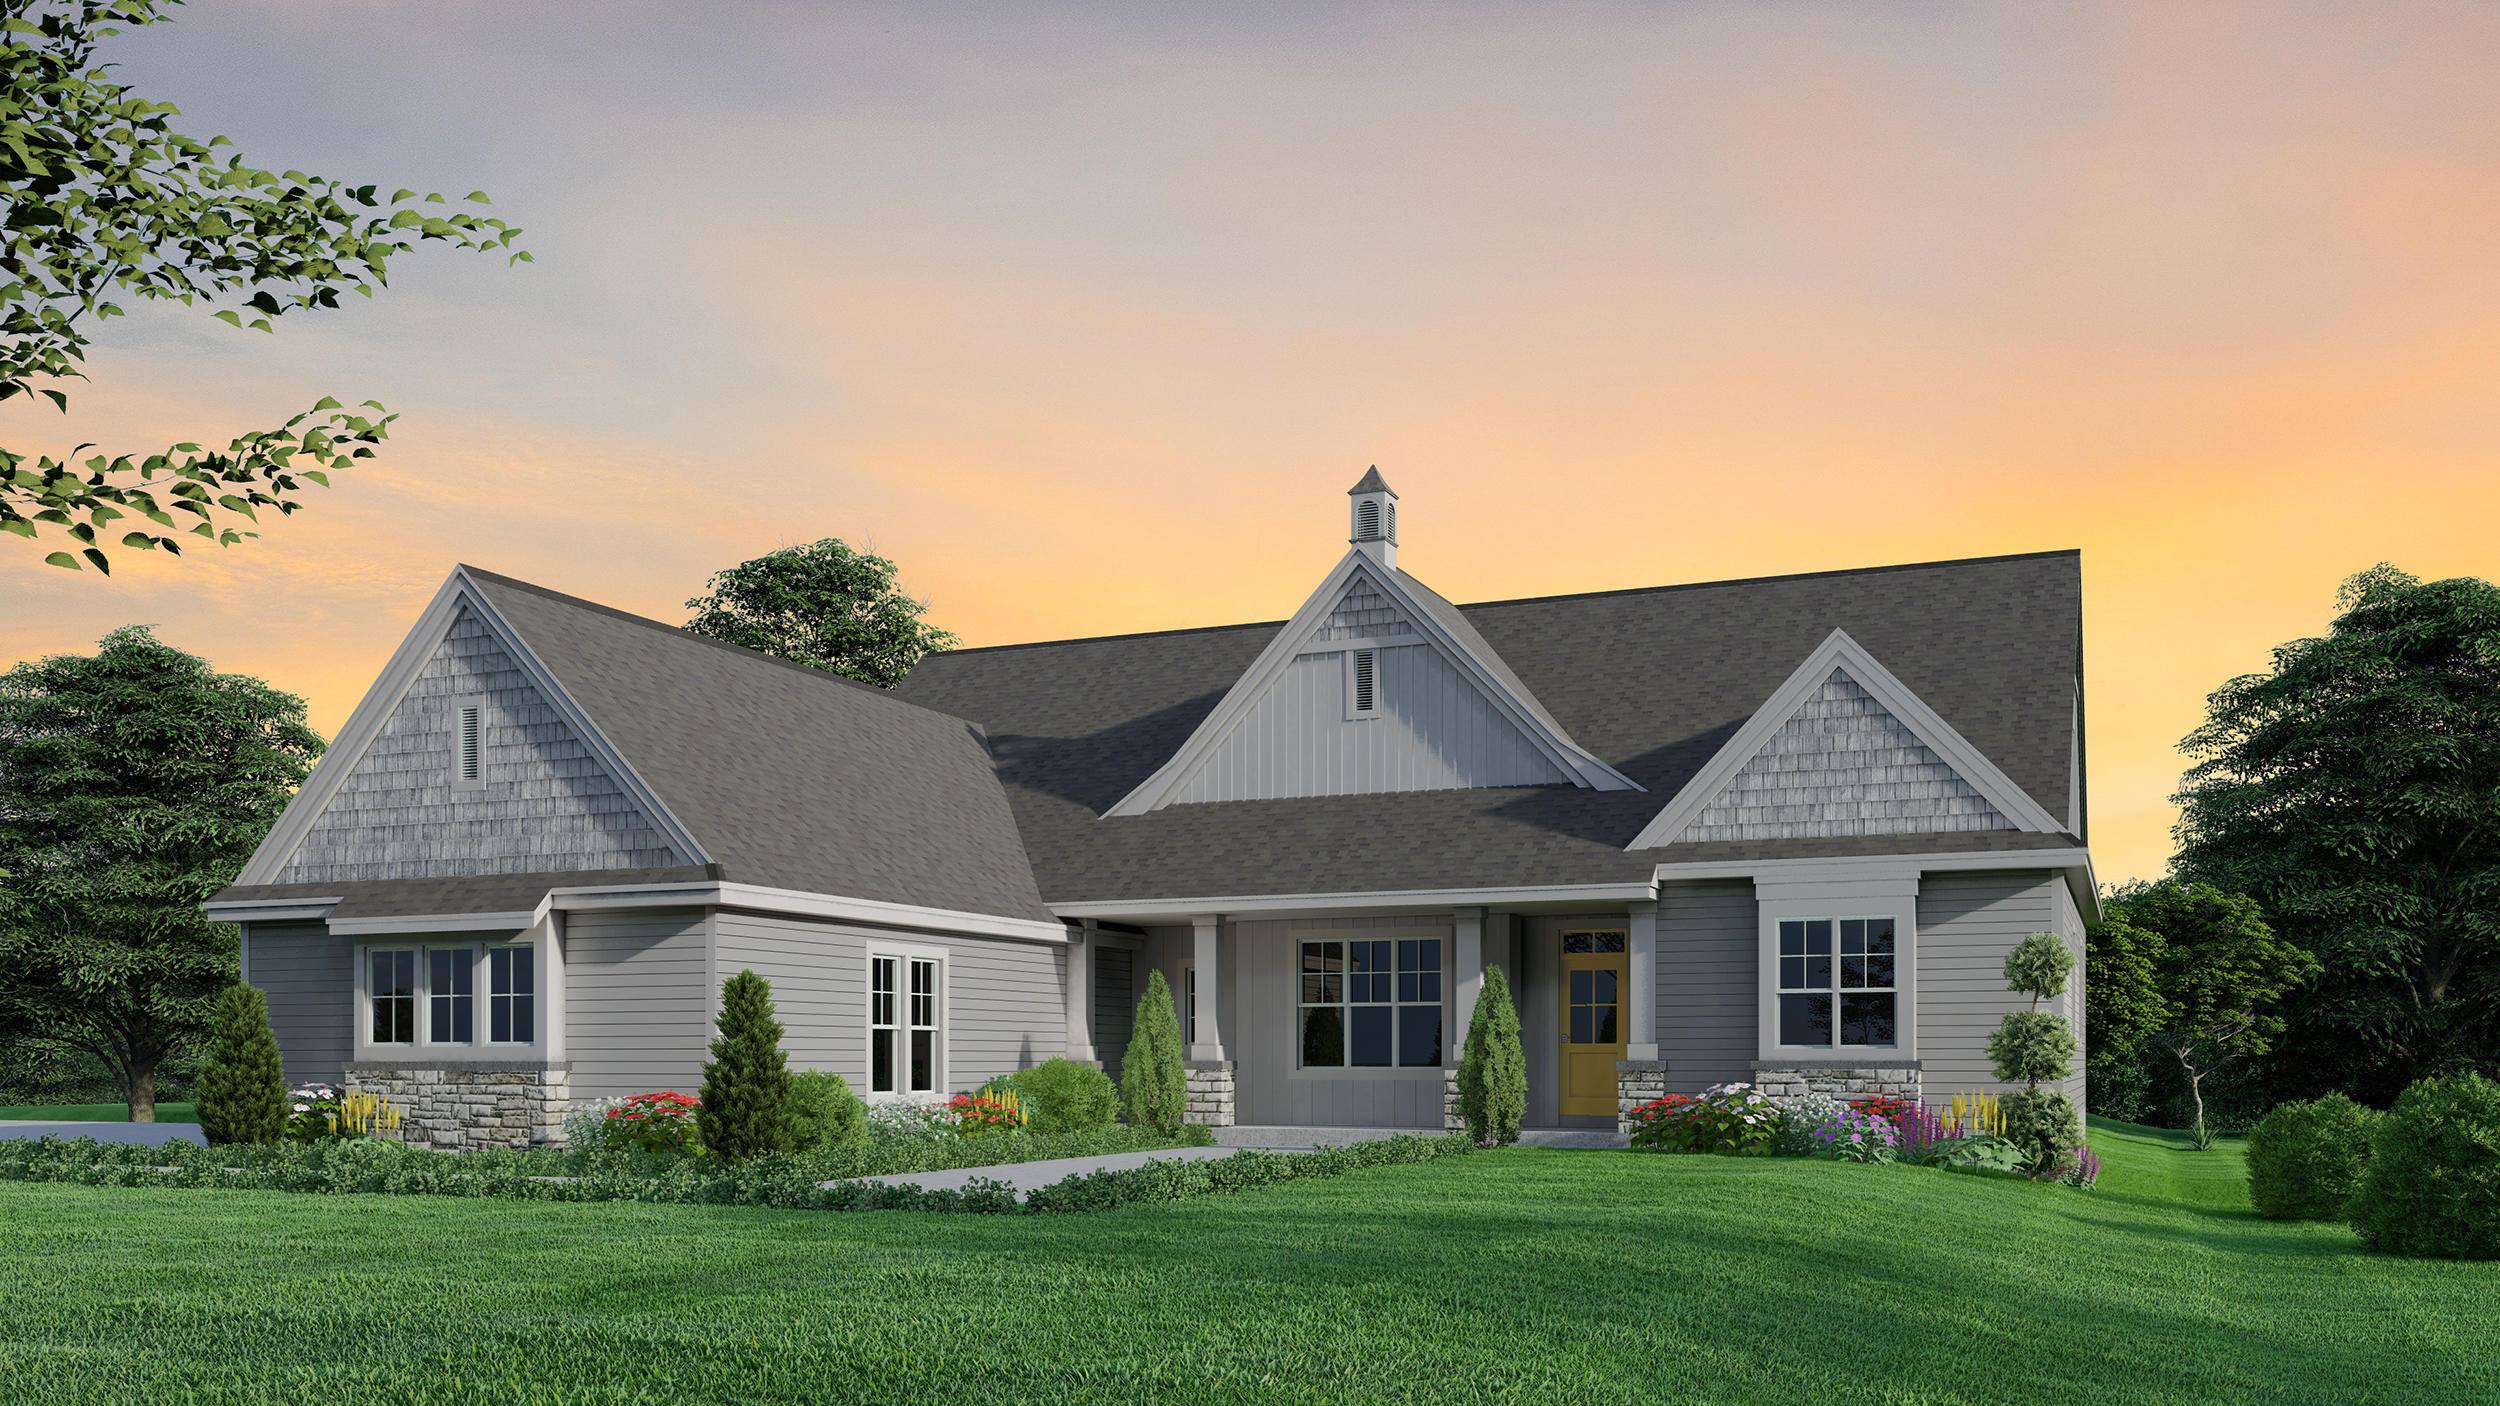 1637 Twisted Oak Ct, Hartland, Wisconsin 53029, 4 Bedrooms Bedrooms, ,3 BathroomsBathrooms,Single-Family,For Sale,Twisted Oak Ct,1758273